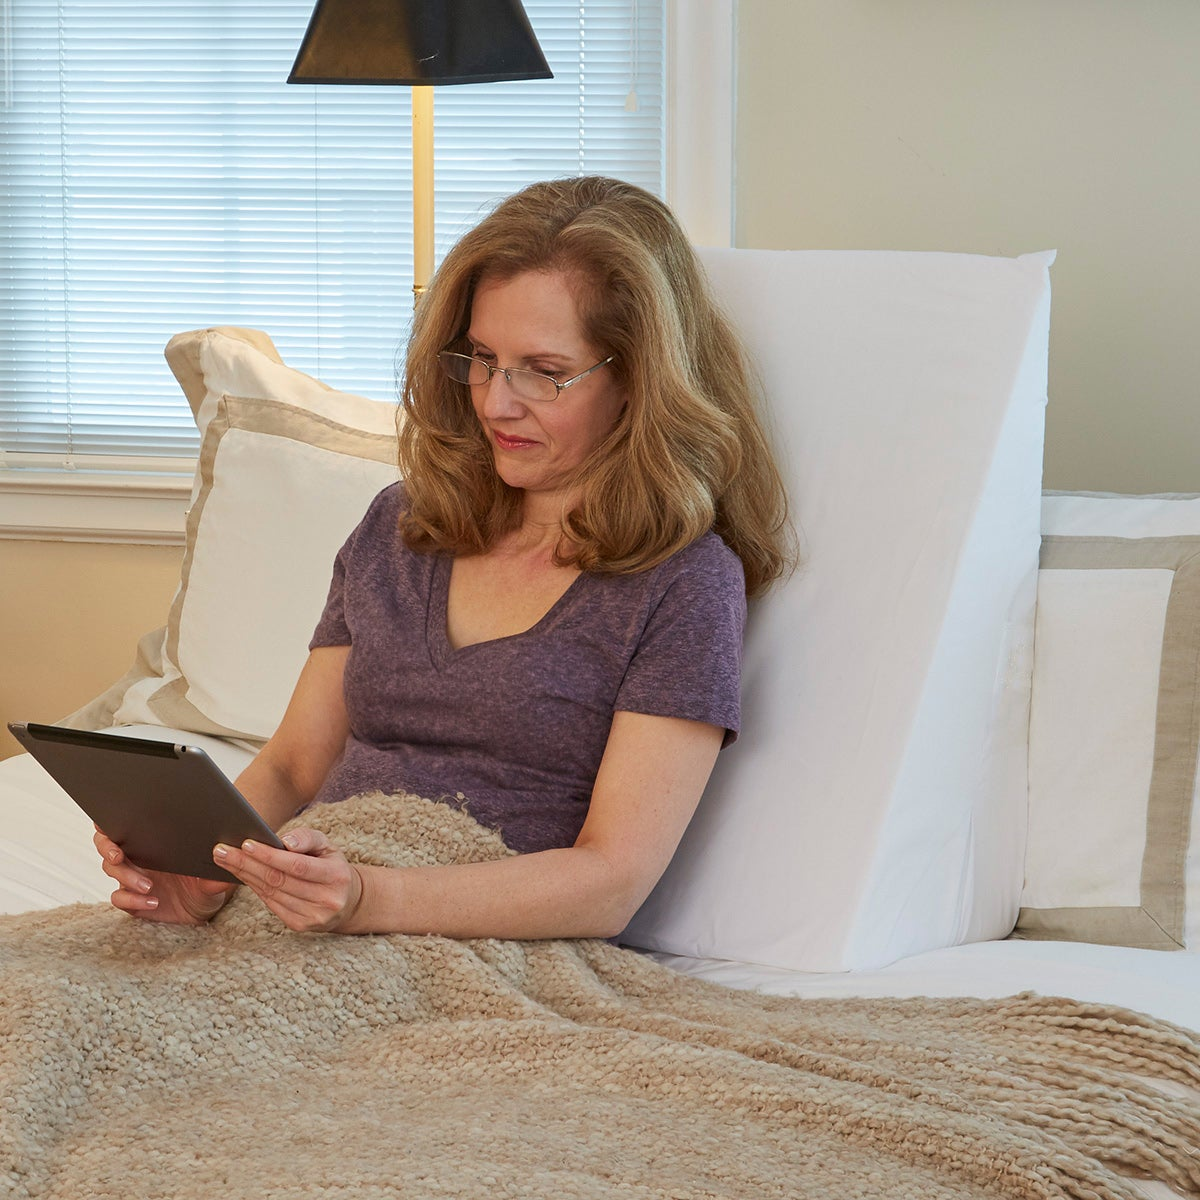 Hermell 7.5-inch Multipurpose Bed Wedge Cushion, White